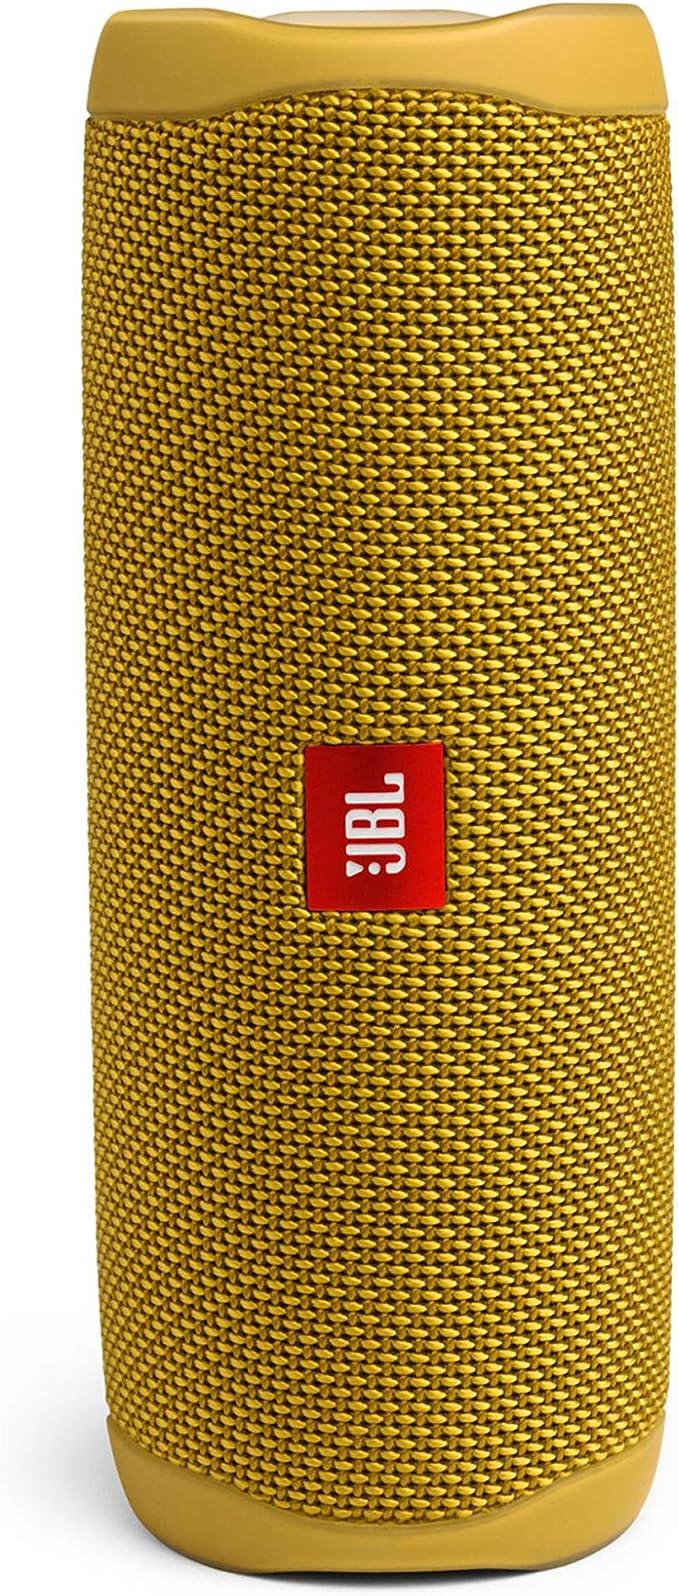 JBL Flip 5 - Altavoz inalámbrico portátil con Bluetooth, Amarillo